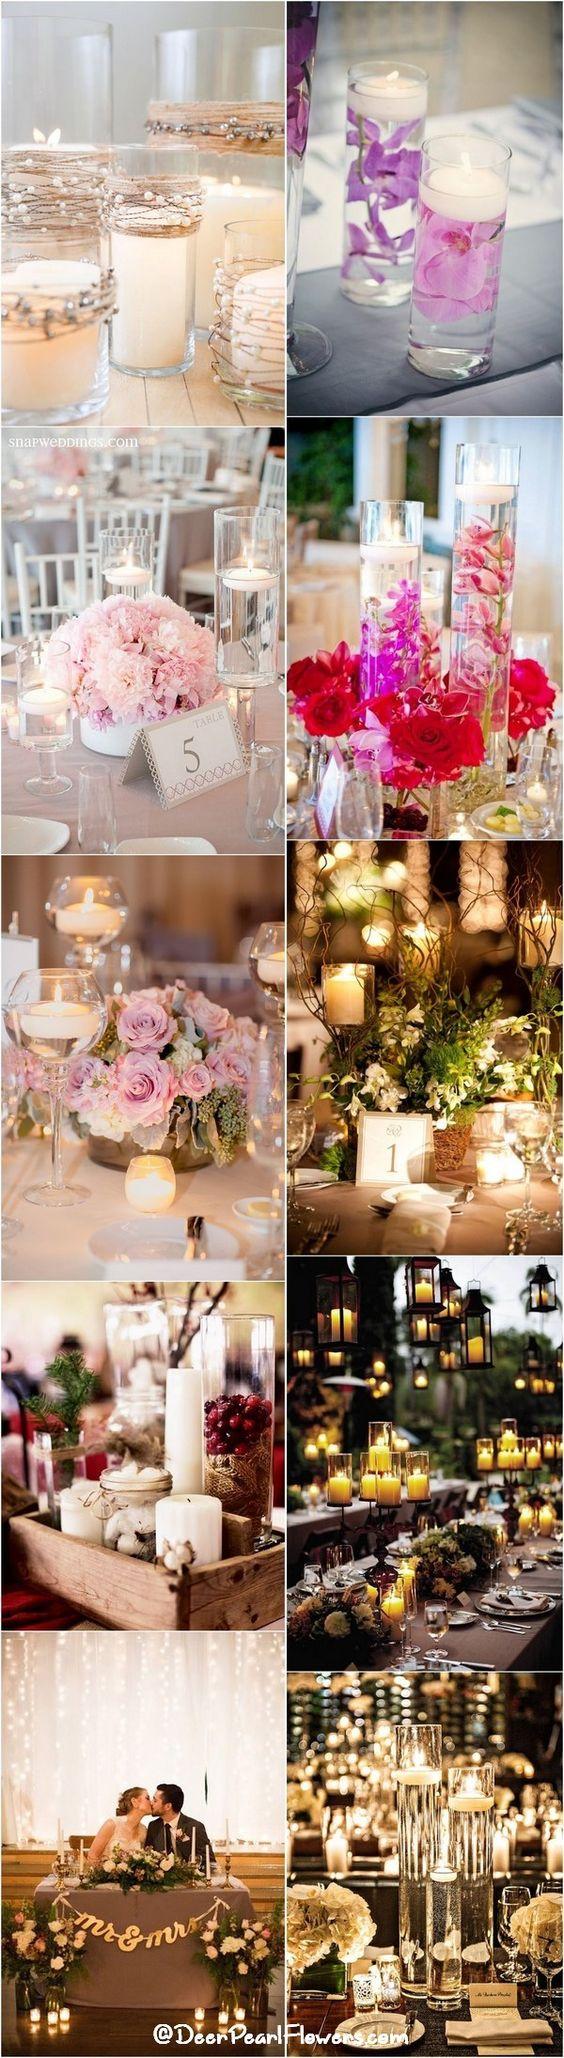 Romantic Candle Wedding Centerpiece Ideas / http://www.deerpearlflowers.com/wedding-ideas-using-candles/: